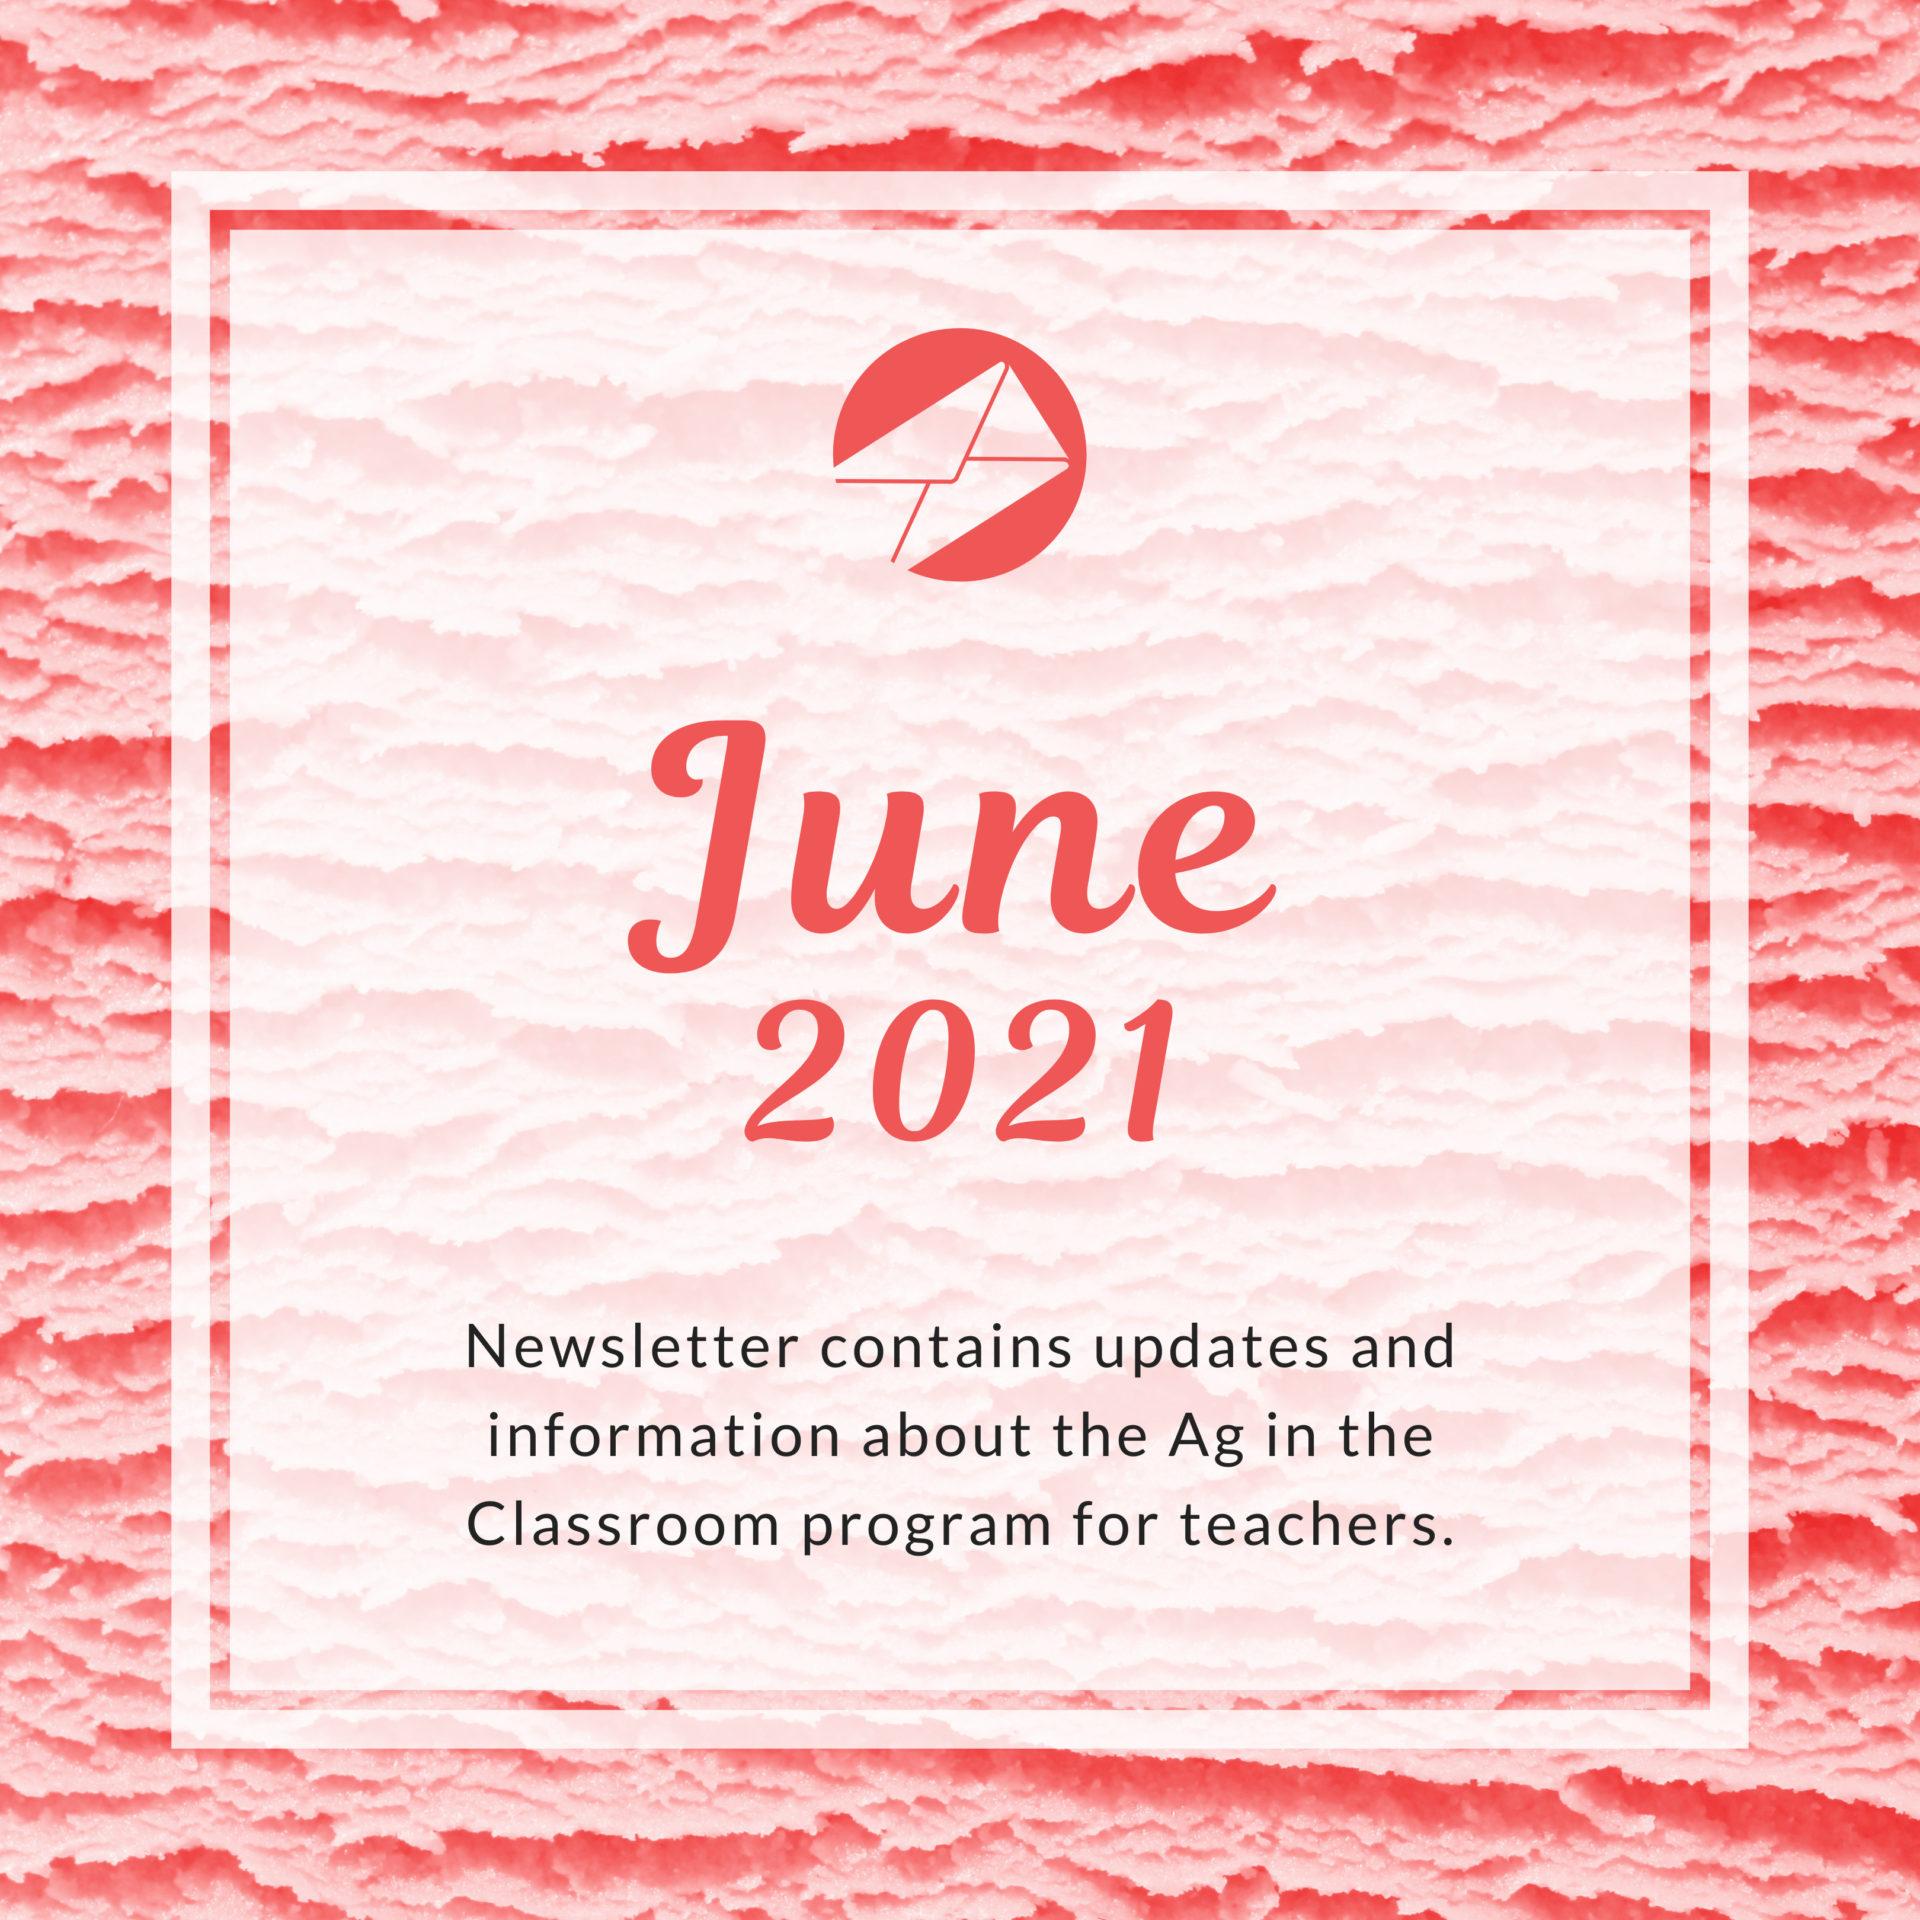 June 2021 Teachers